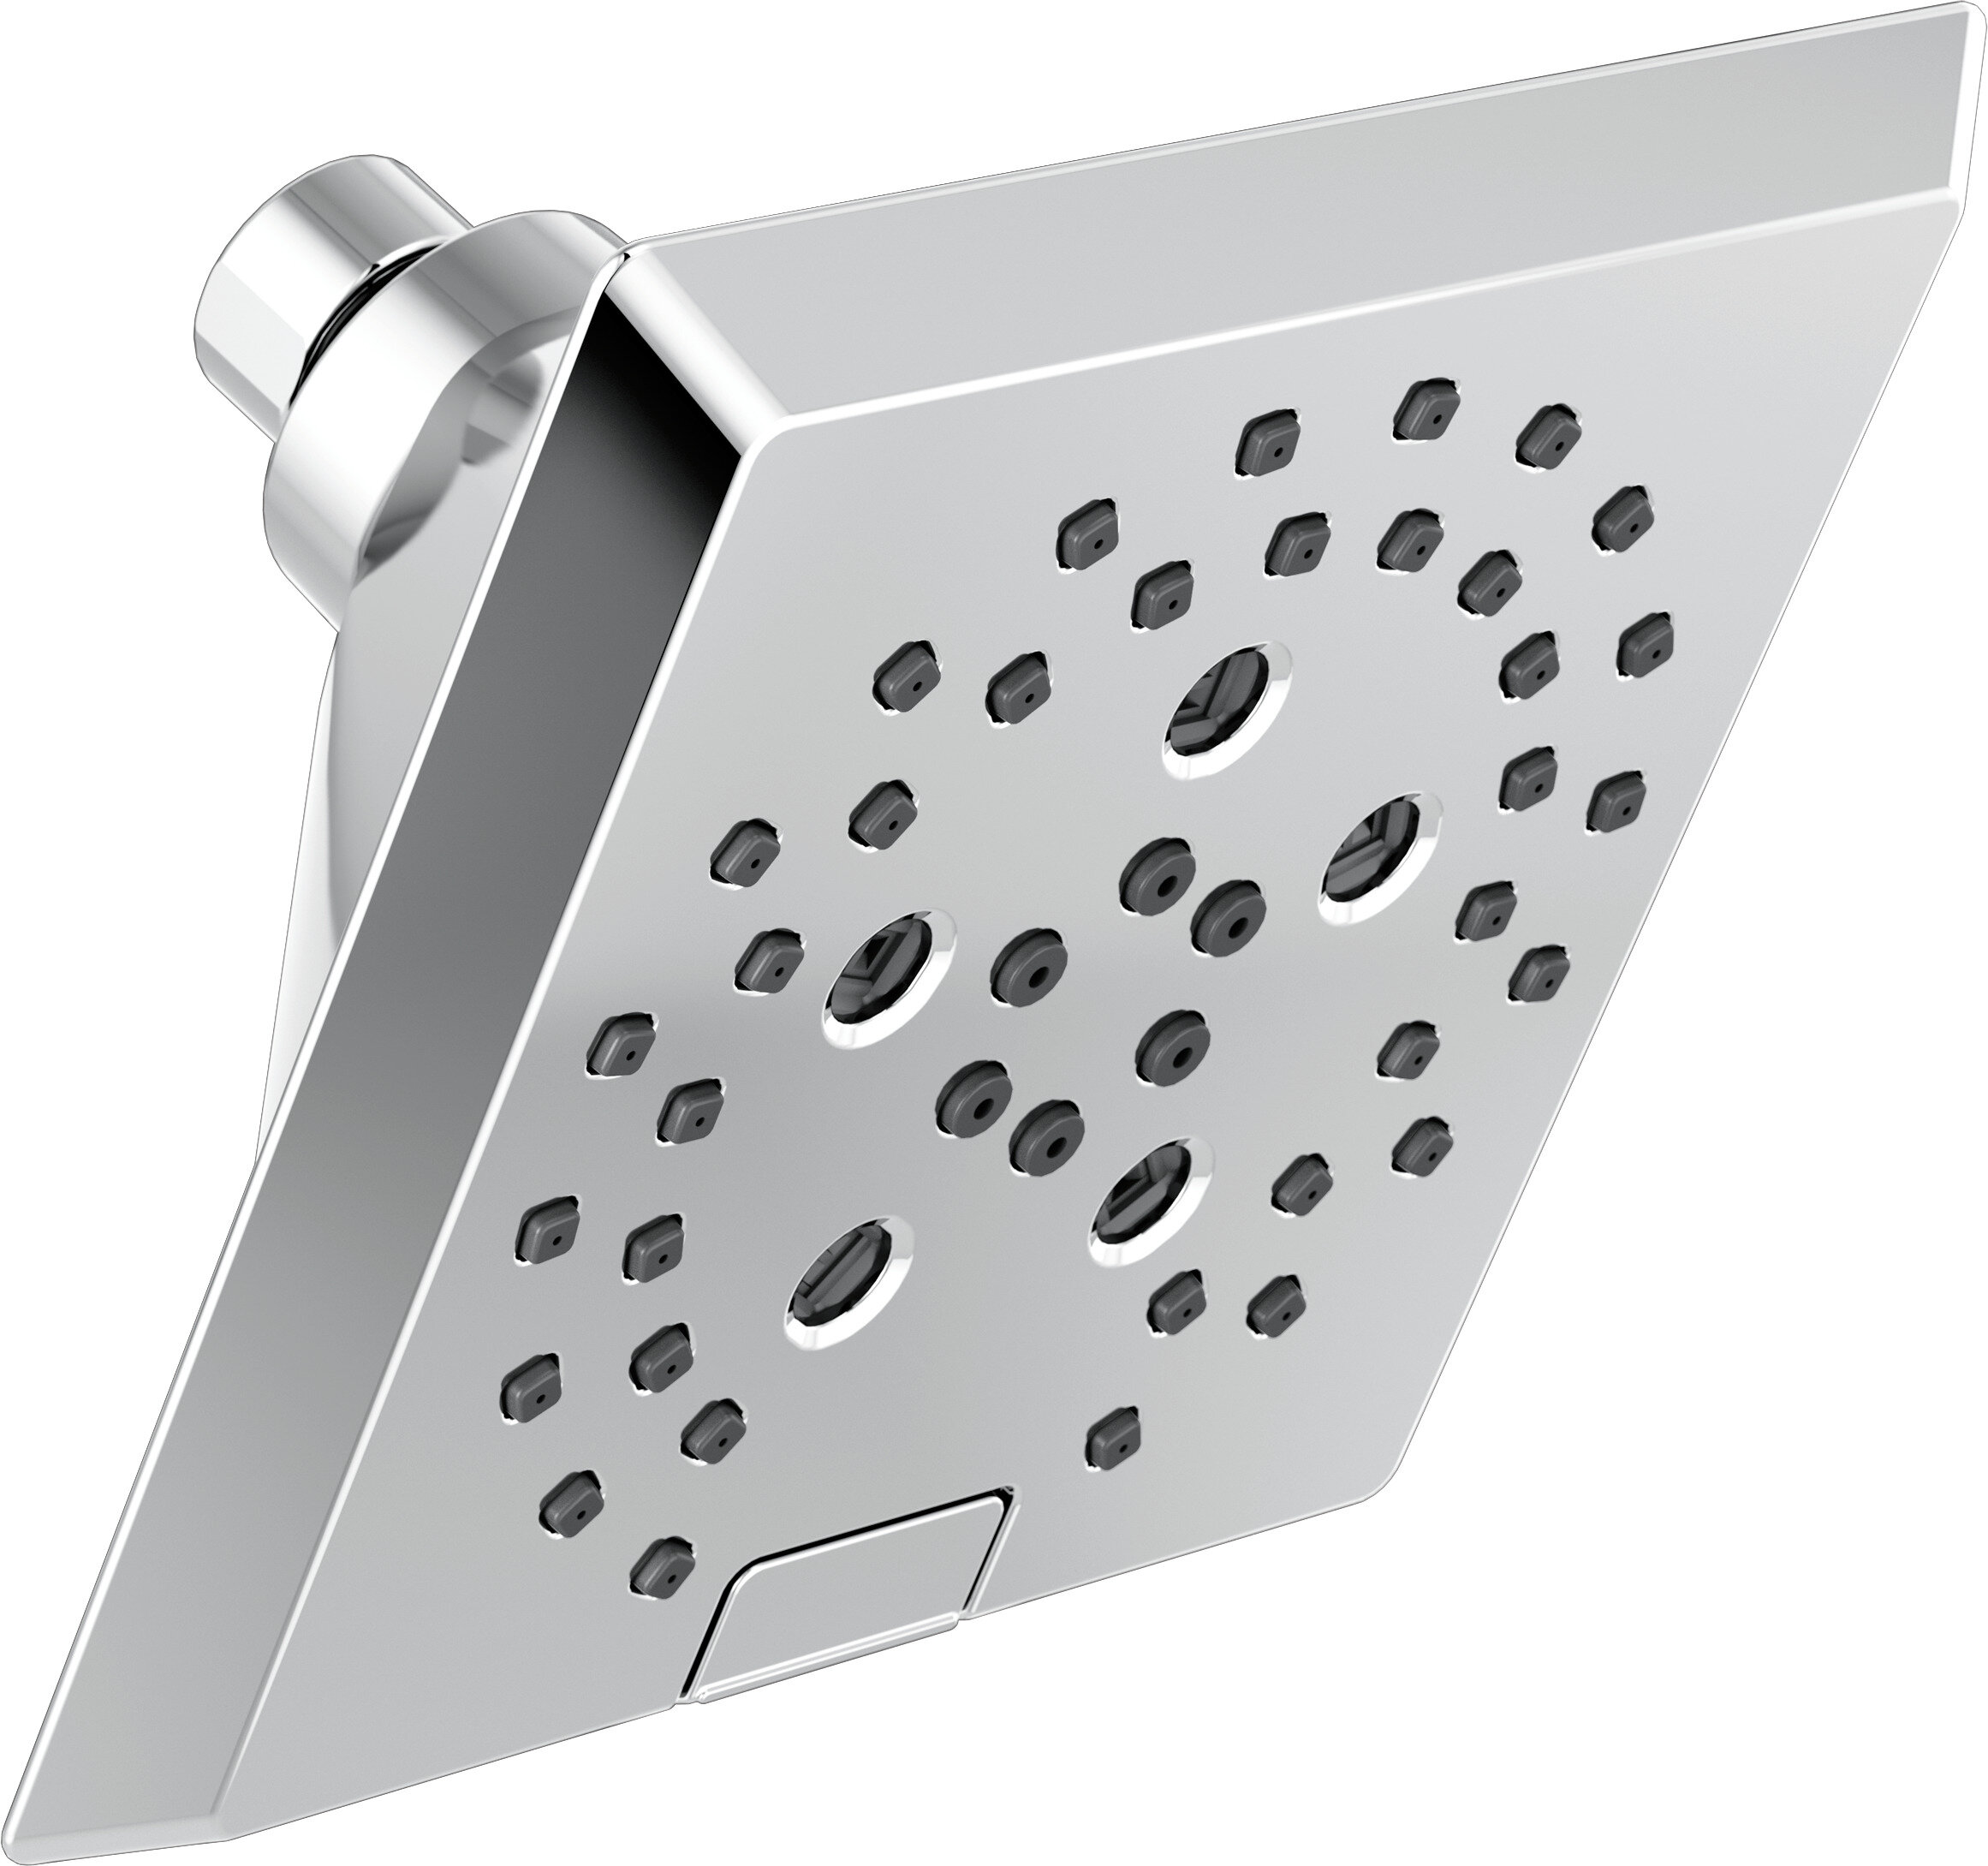 and r shower body discount plumbing spray trim rough touch speakman head clean brizo lux kitchen index accessories hardware home